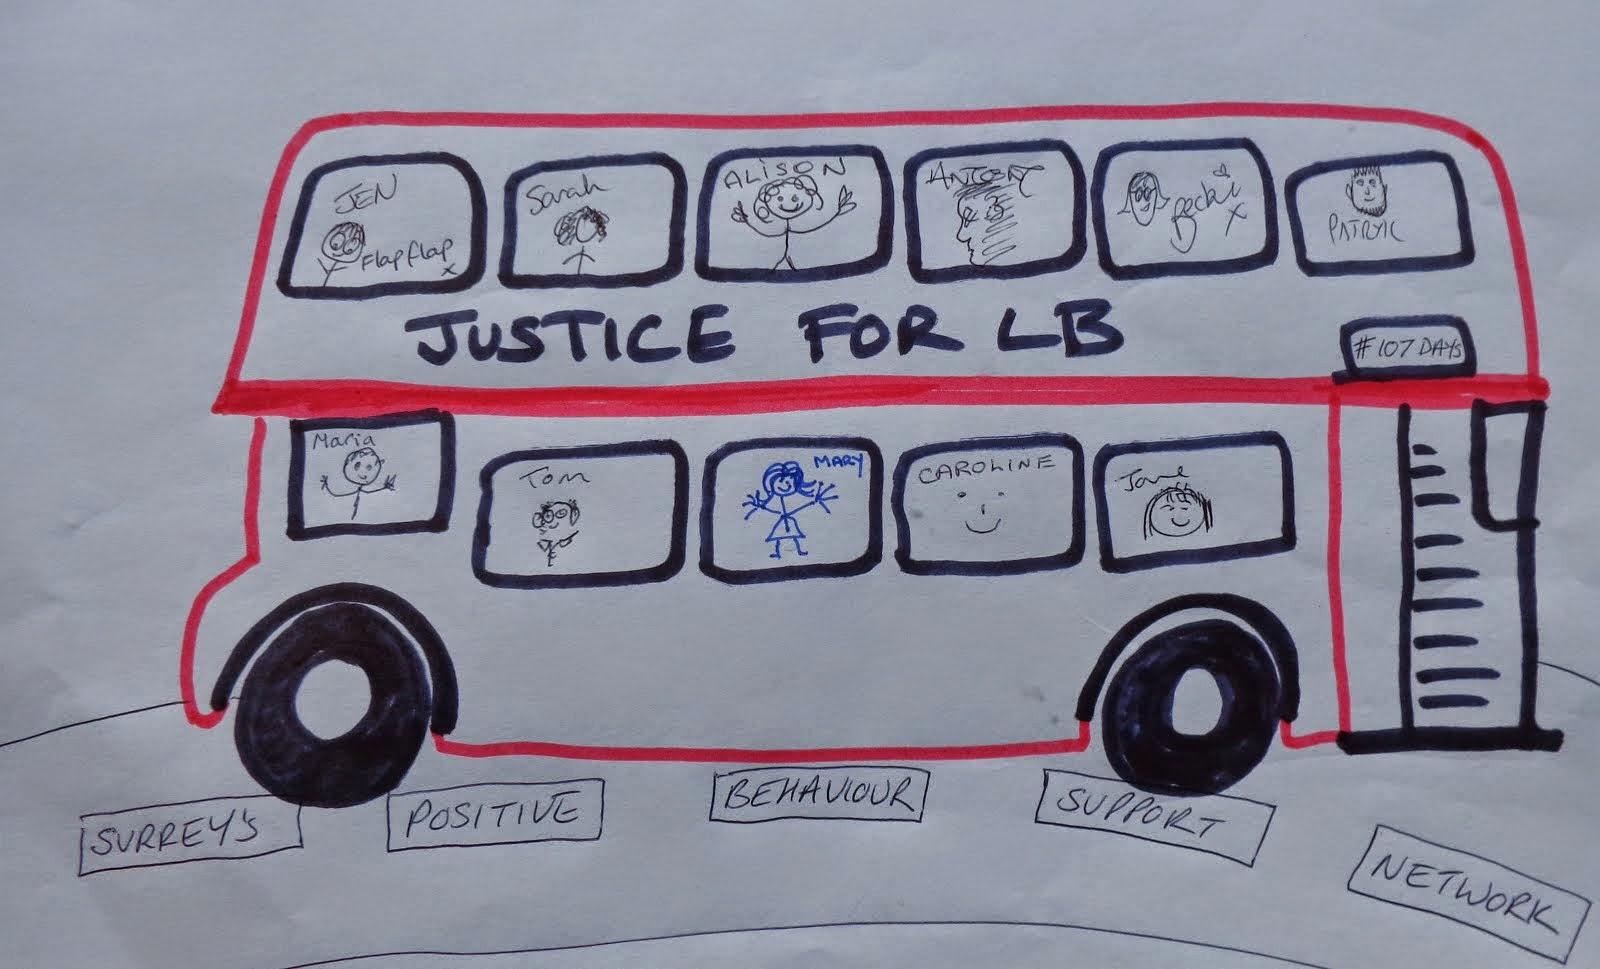 #JusticeforLB